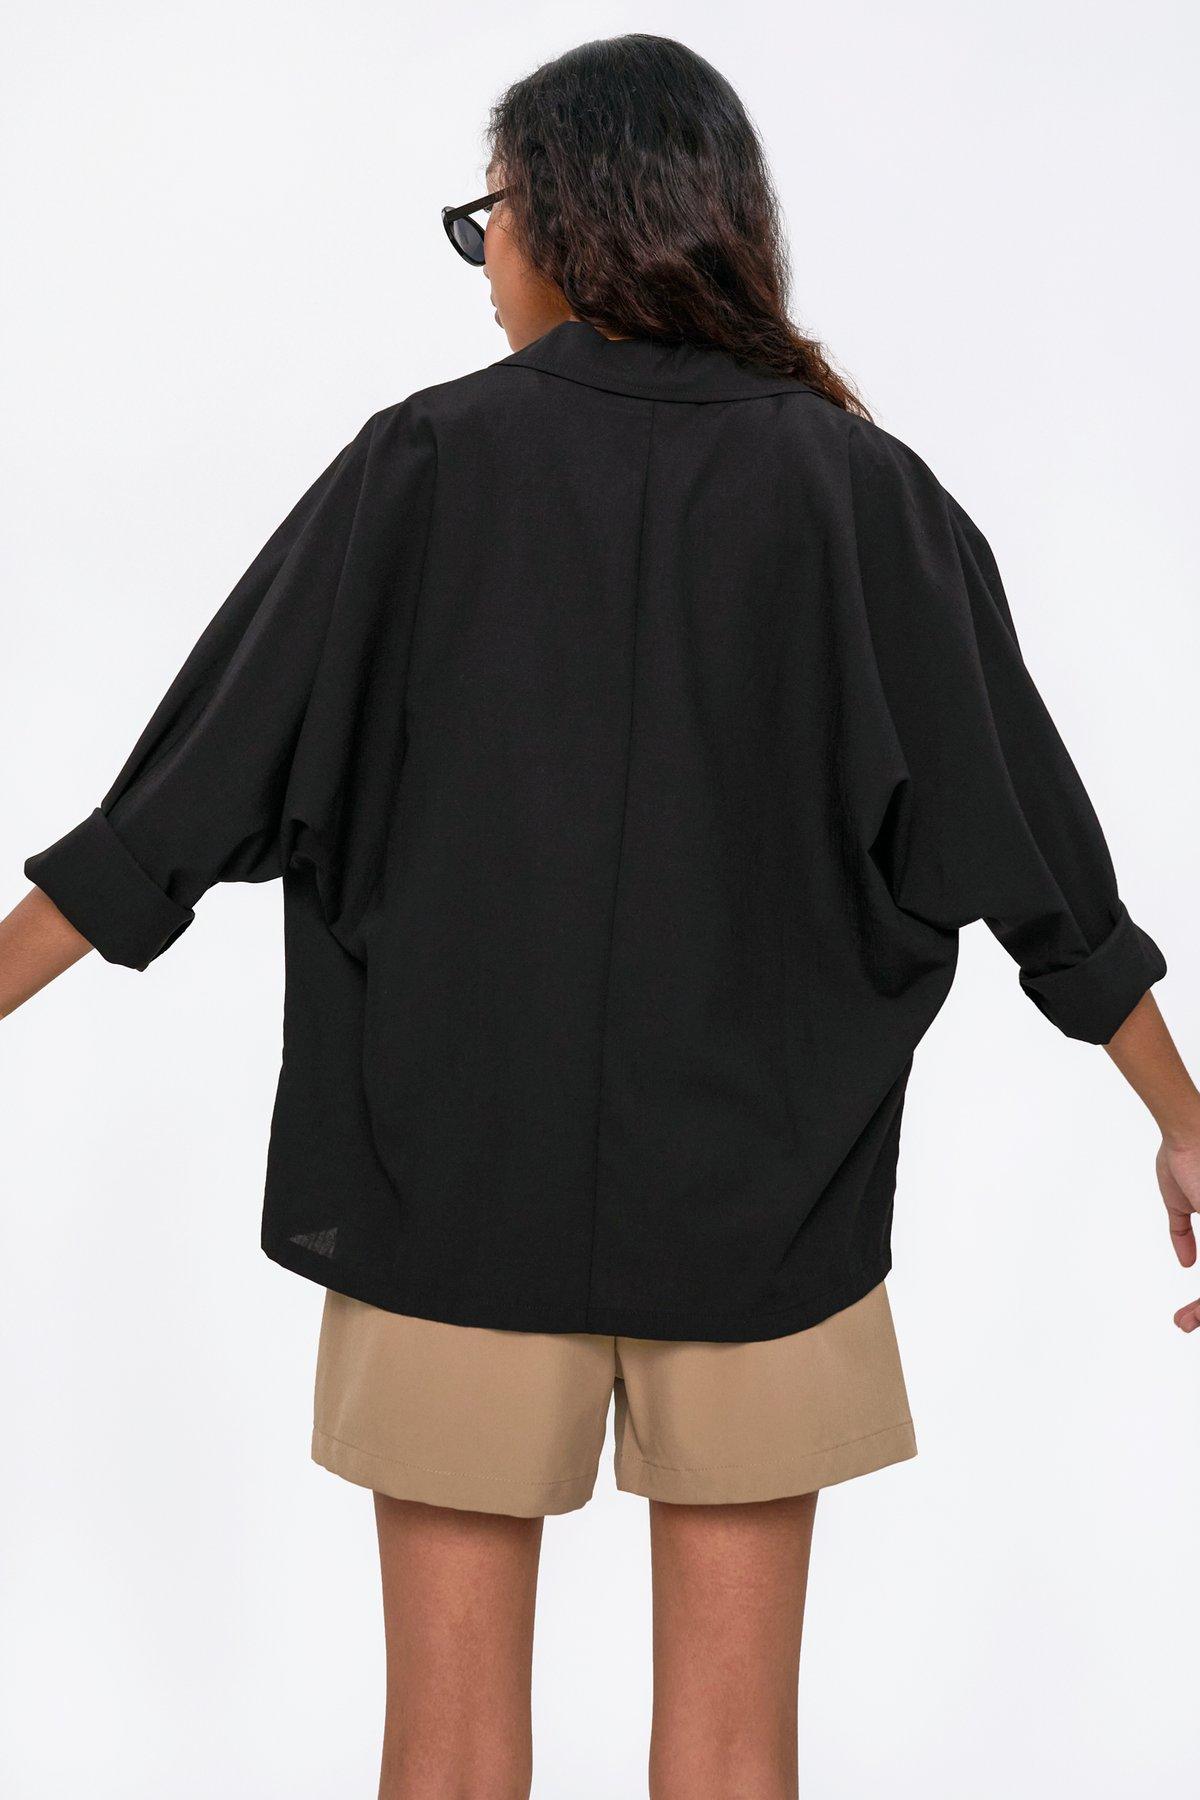 Lance Lightweight Cotton Blazer Shirt (Black)